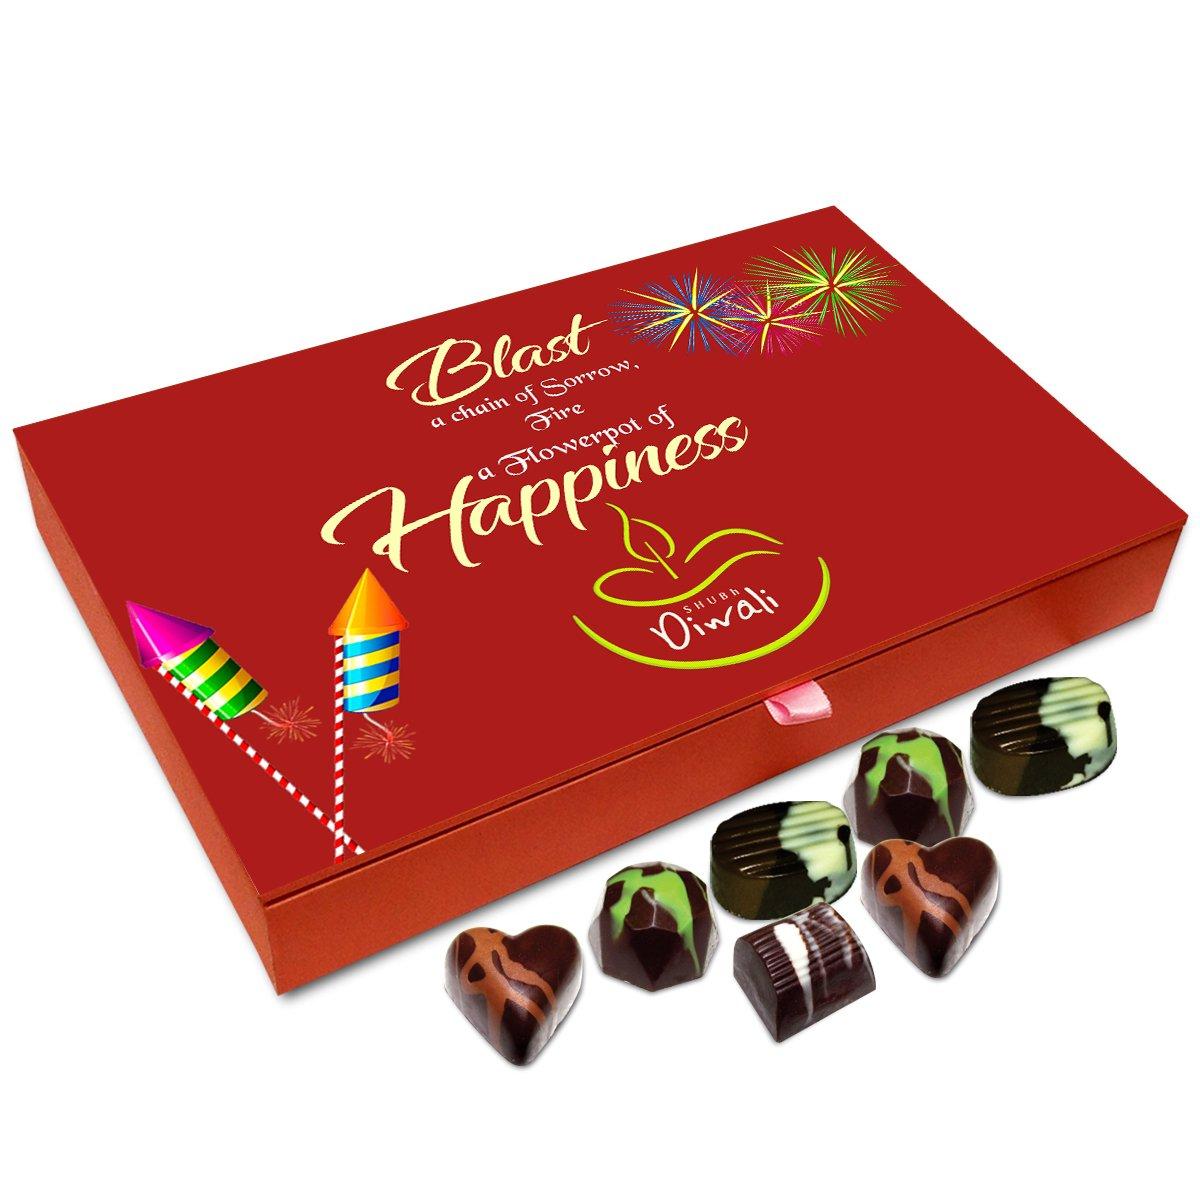 Chocholik Diwali Gift Box – Fire A Flowerpot of Happiness This Diwali Chocolate Box – 12pc